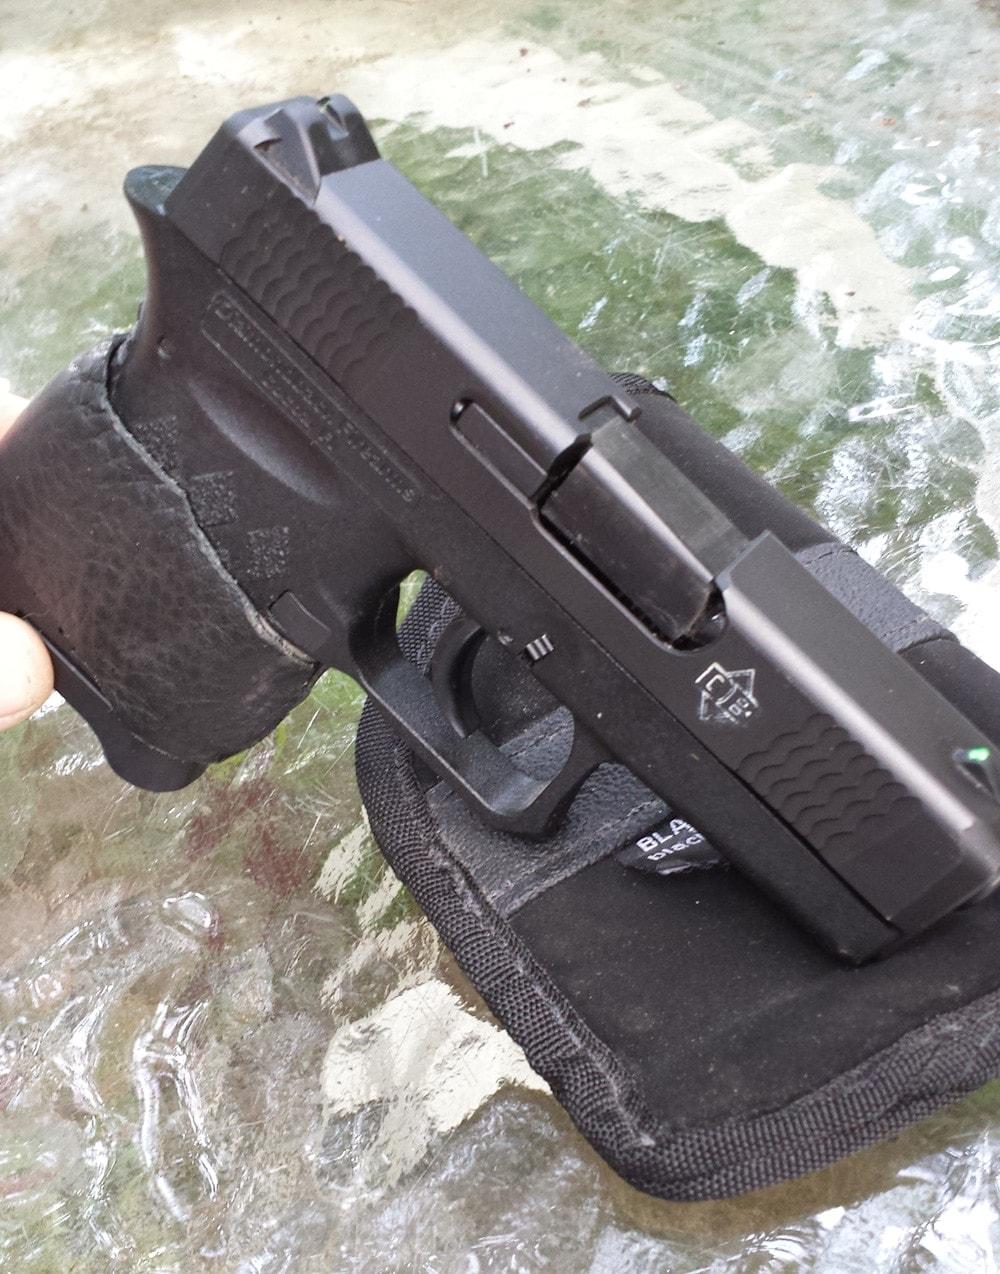 Gun Review: Want a tiny, tiny pistol? Diamondback DB9 is the answer